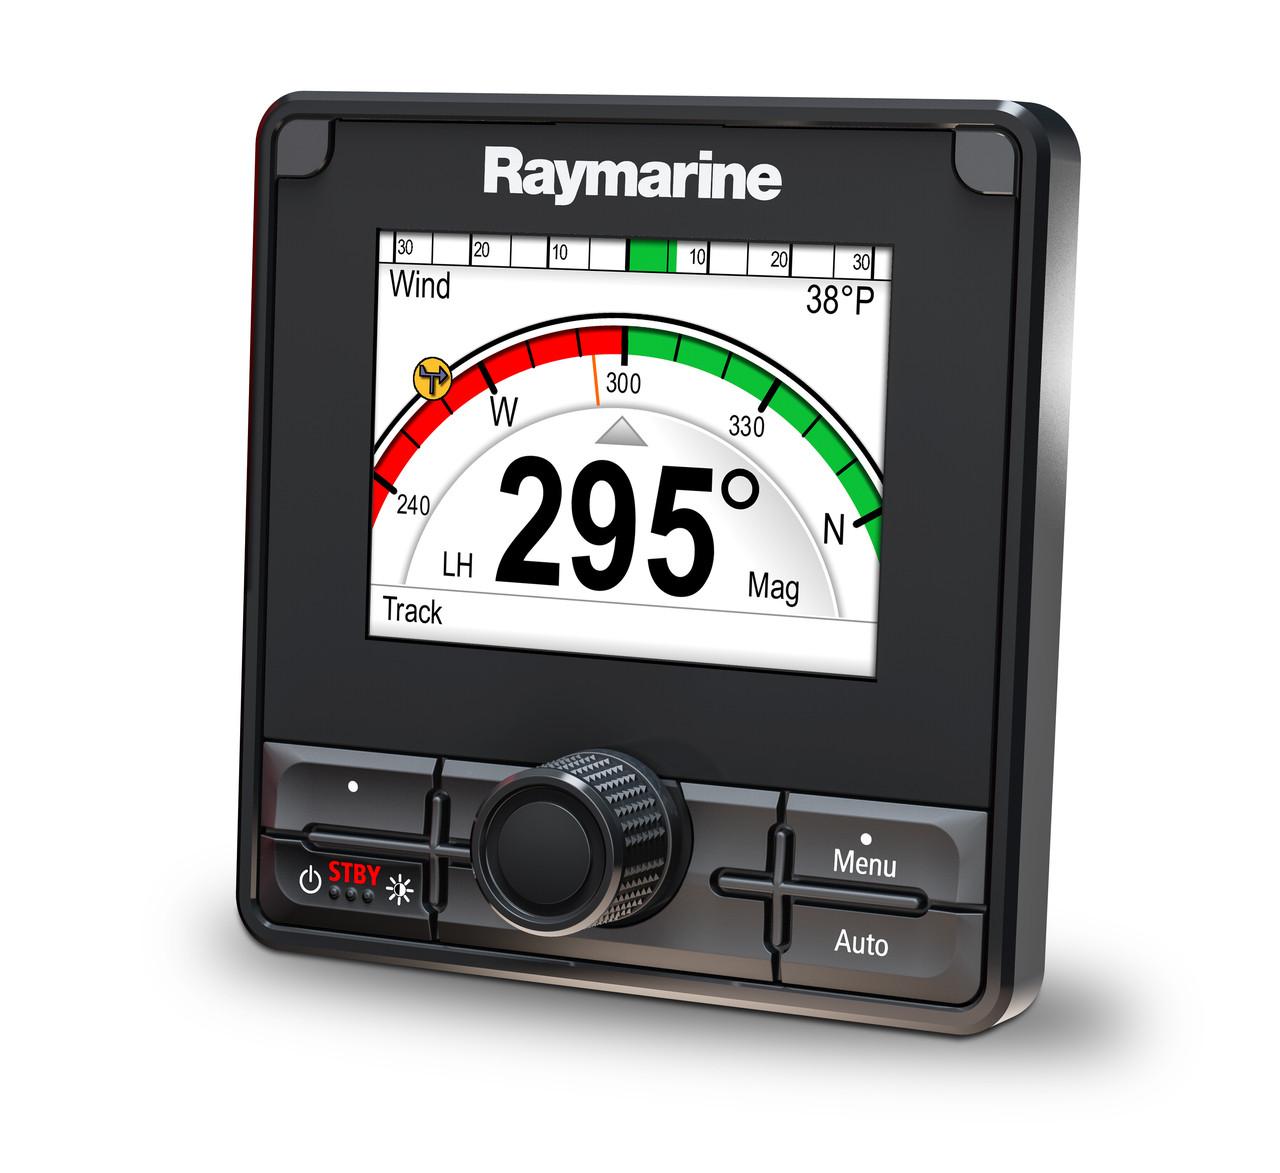 Raymarine p70Rs Autopilot Control Head Left View